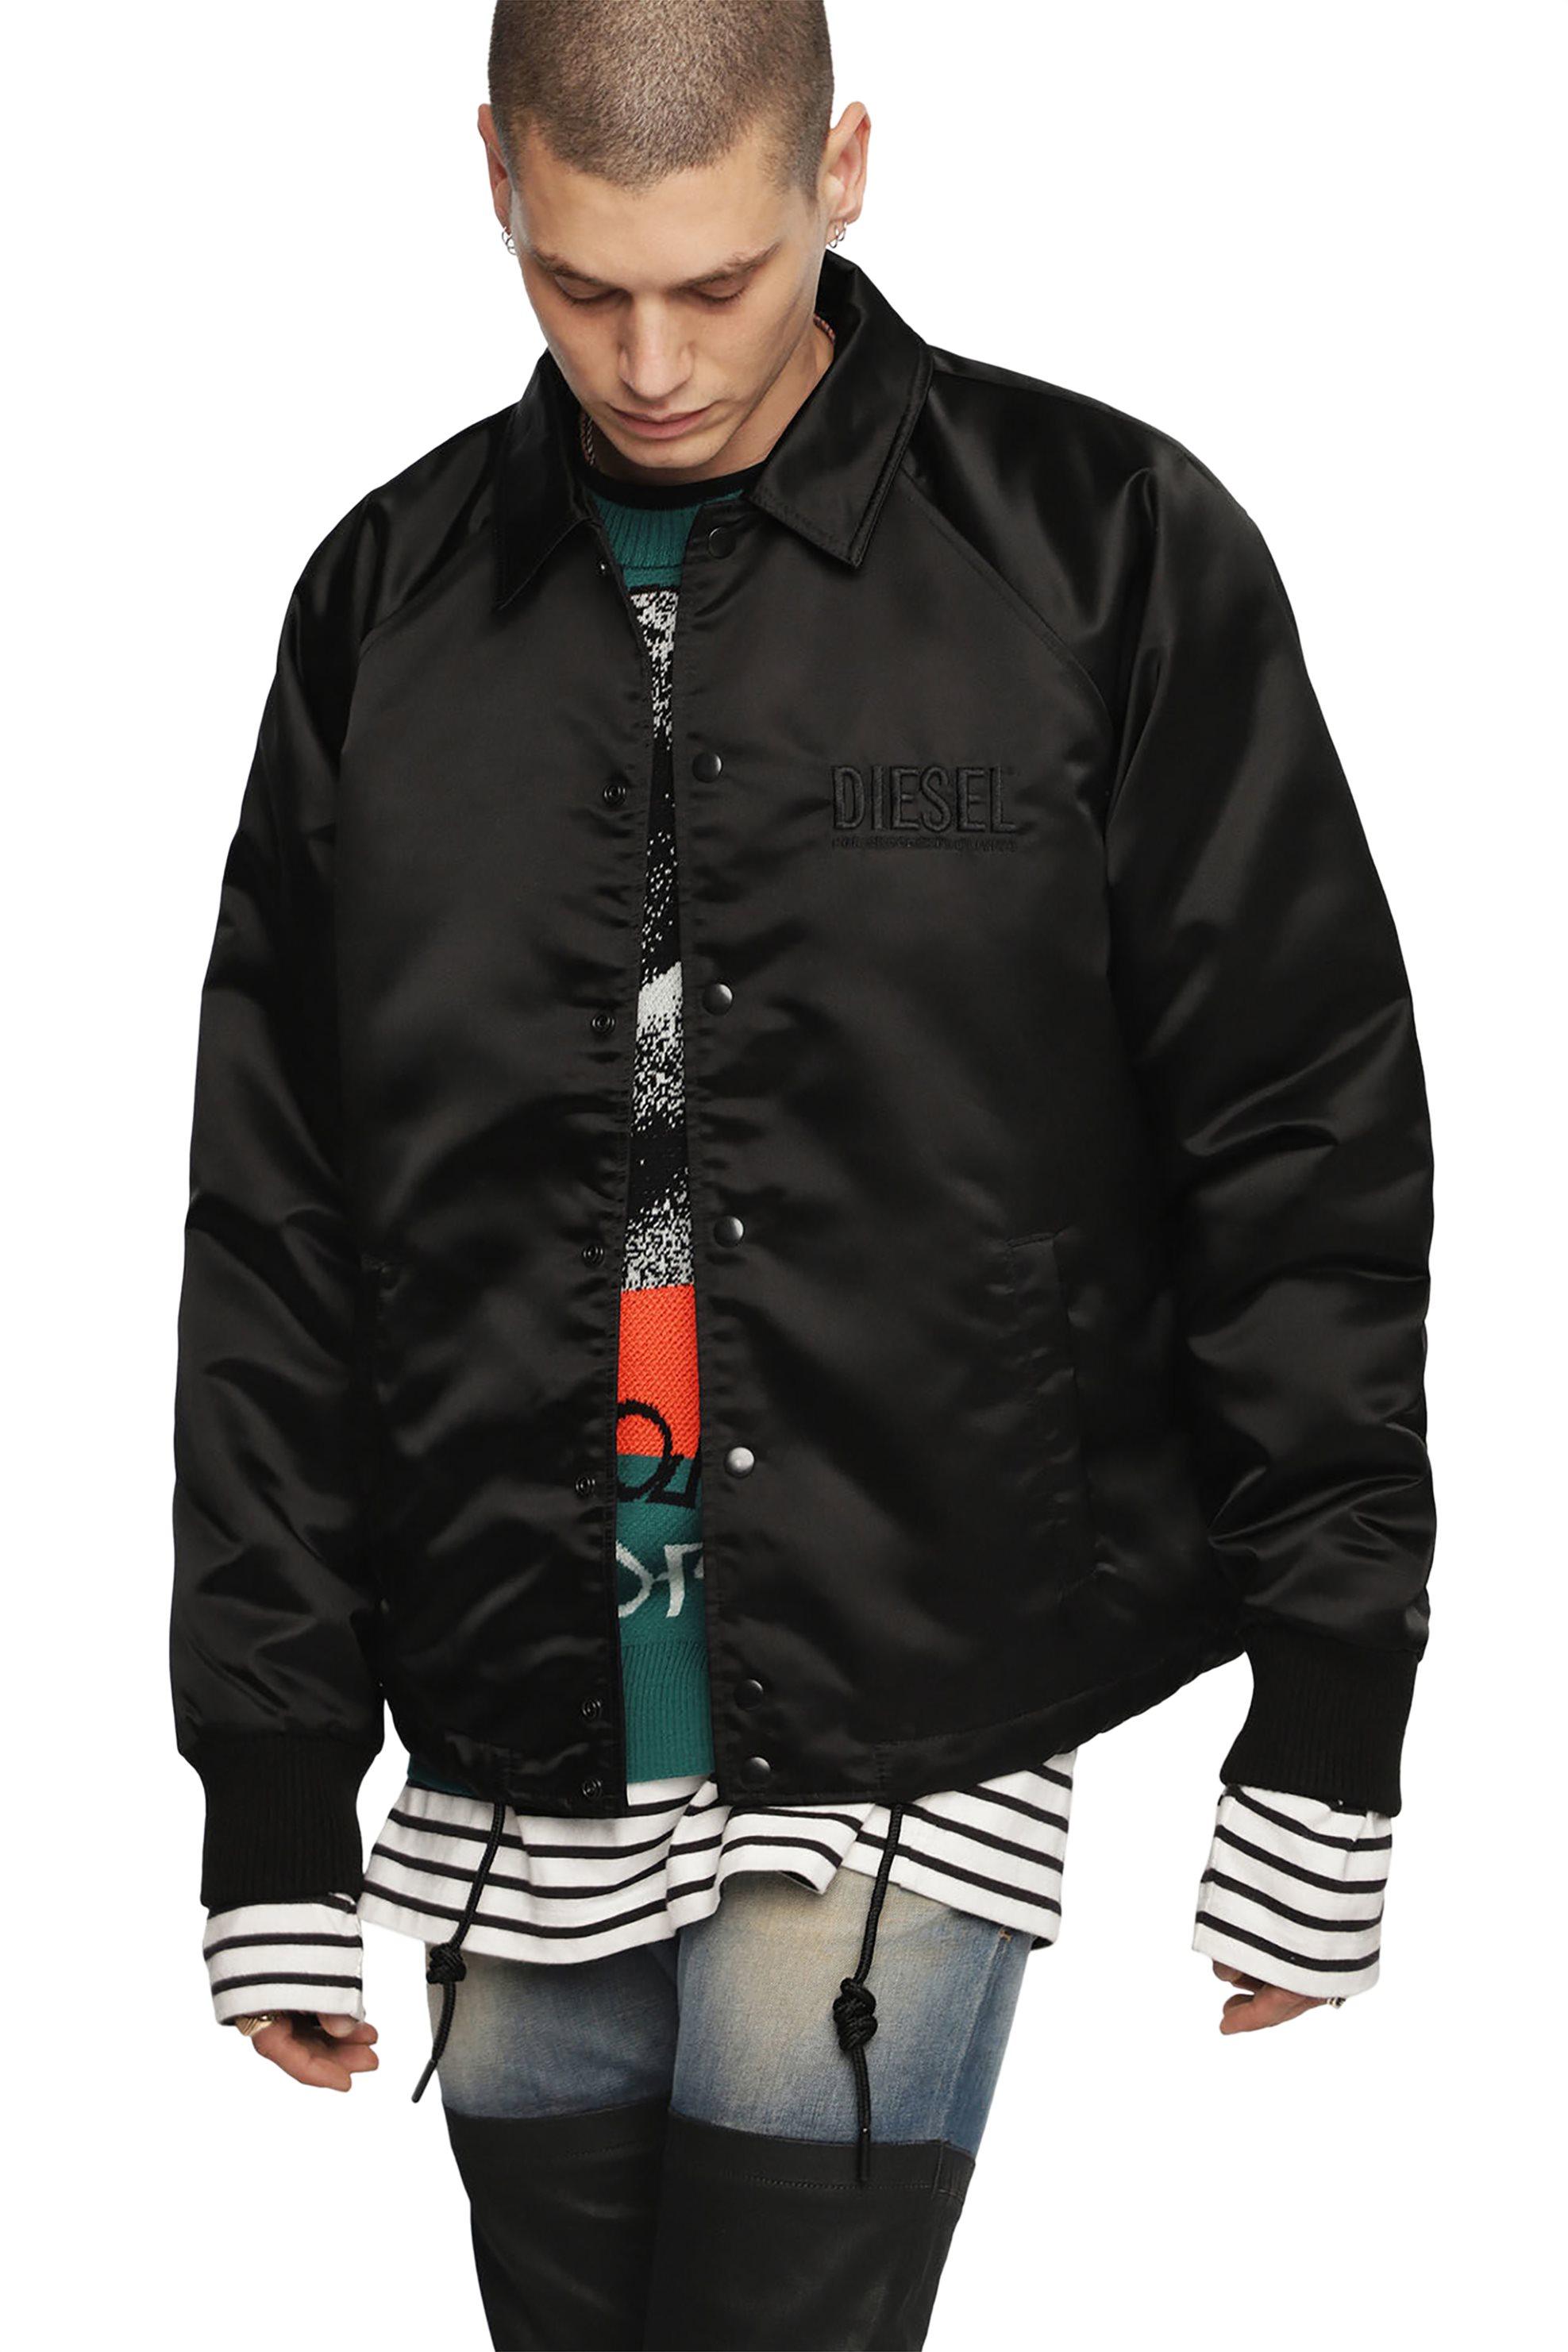 86ad215152f1 Notos Diesel ανδρικό jacket με γυαλιστερό ύφασμα J-Akio - 00SMEM 0KASO -  Μαύρο